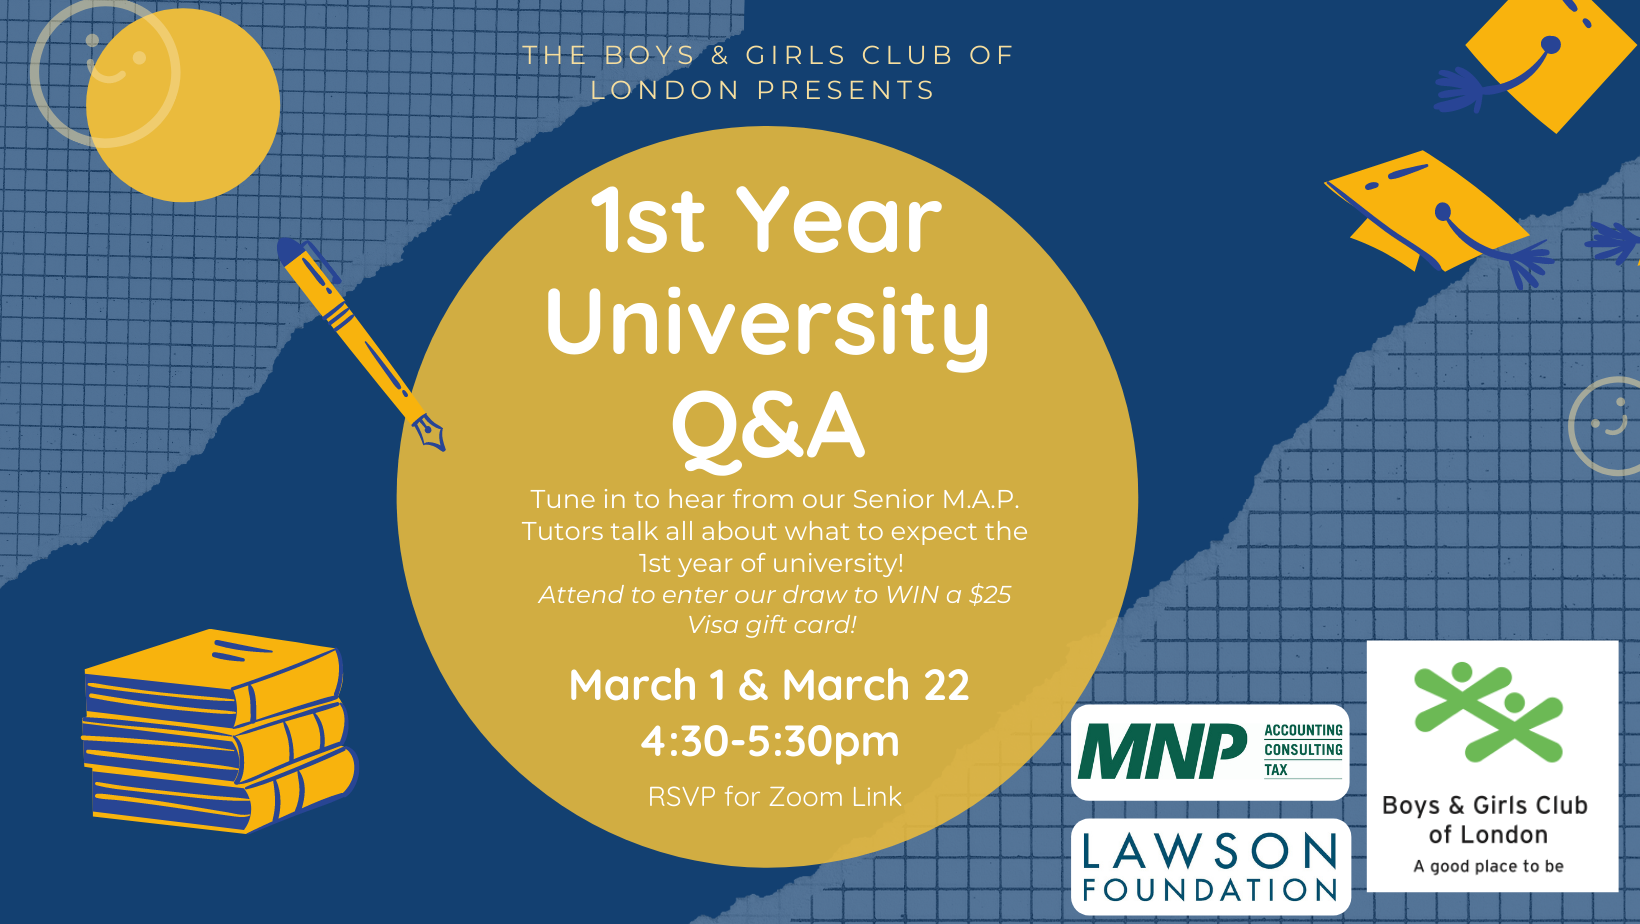 1st Year University Q&A